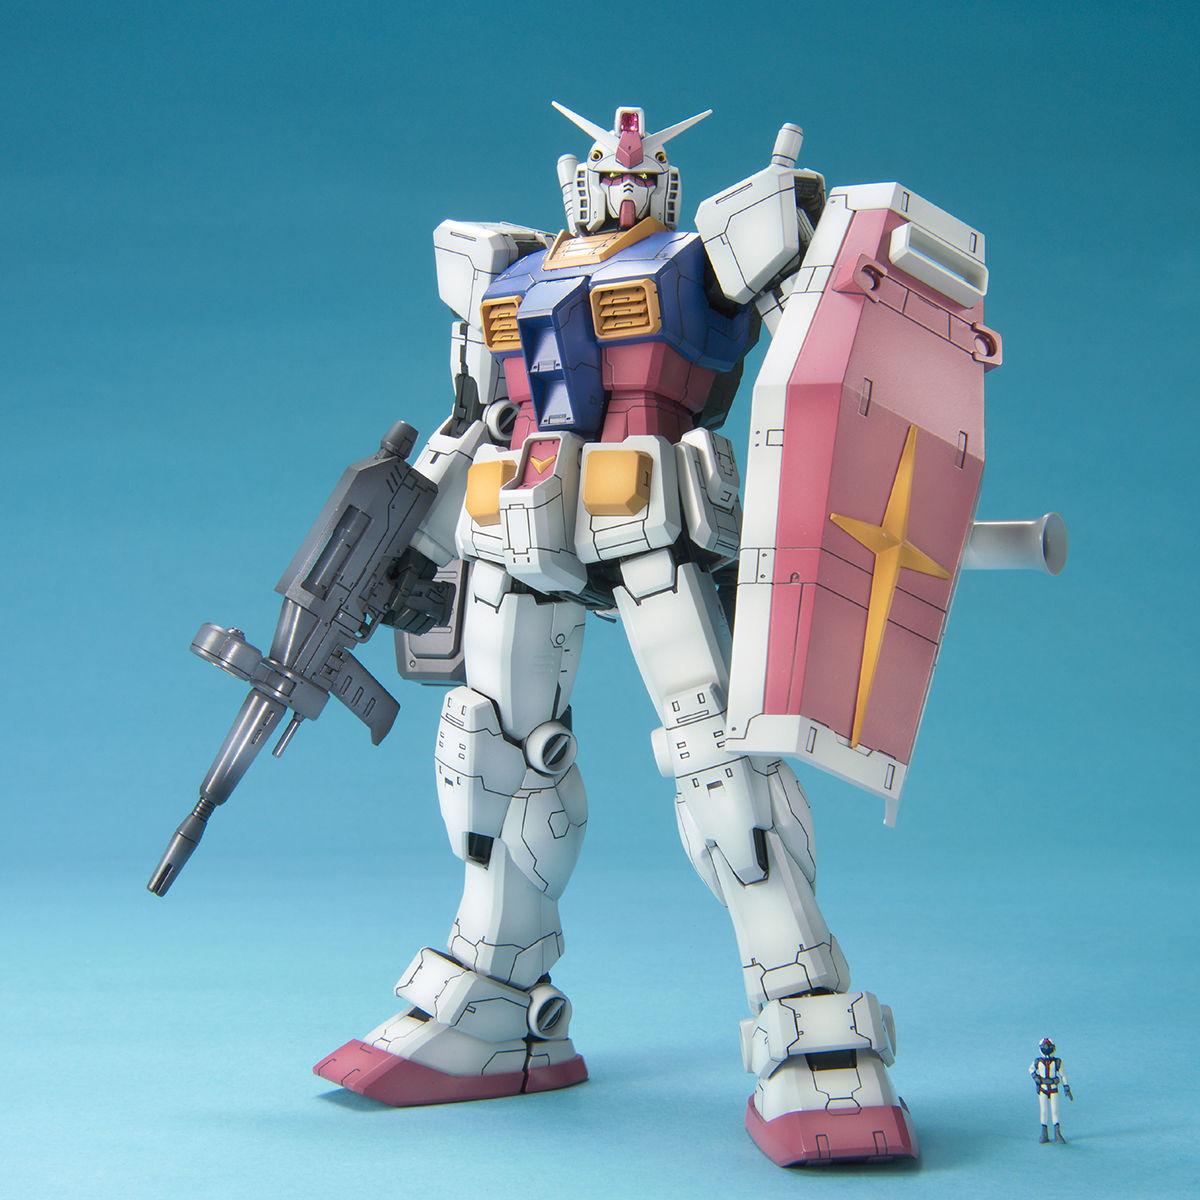 58577MG 1/100 RX-78-2 ガンダム Ver.ONE YEAR WAR 0079 [Gundam Ver. One Year War 0079]